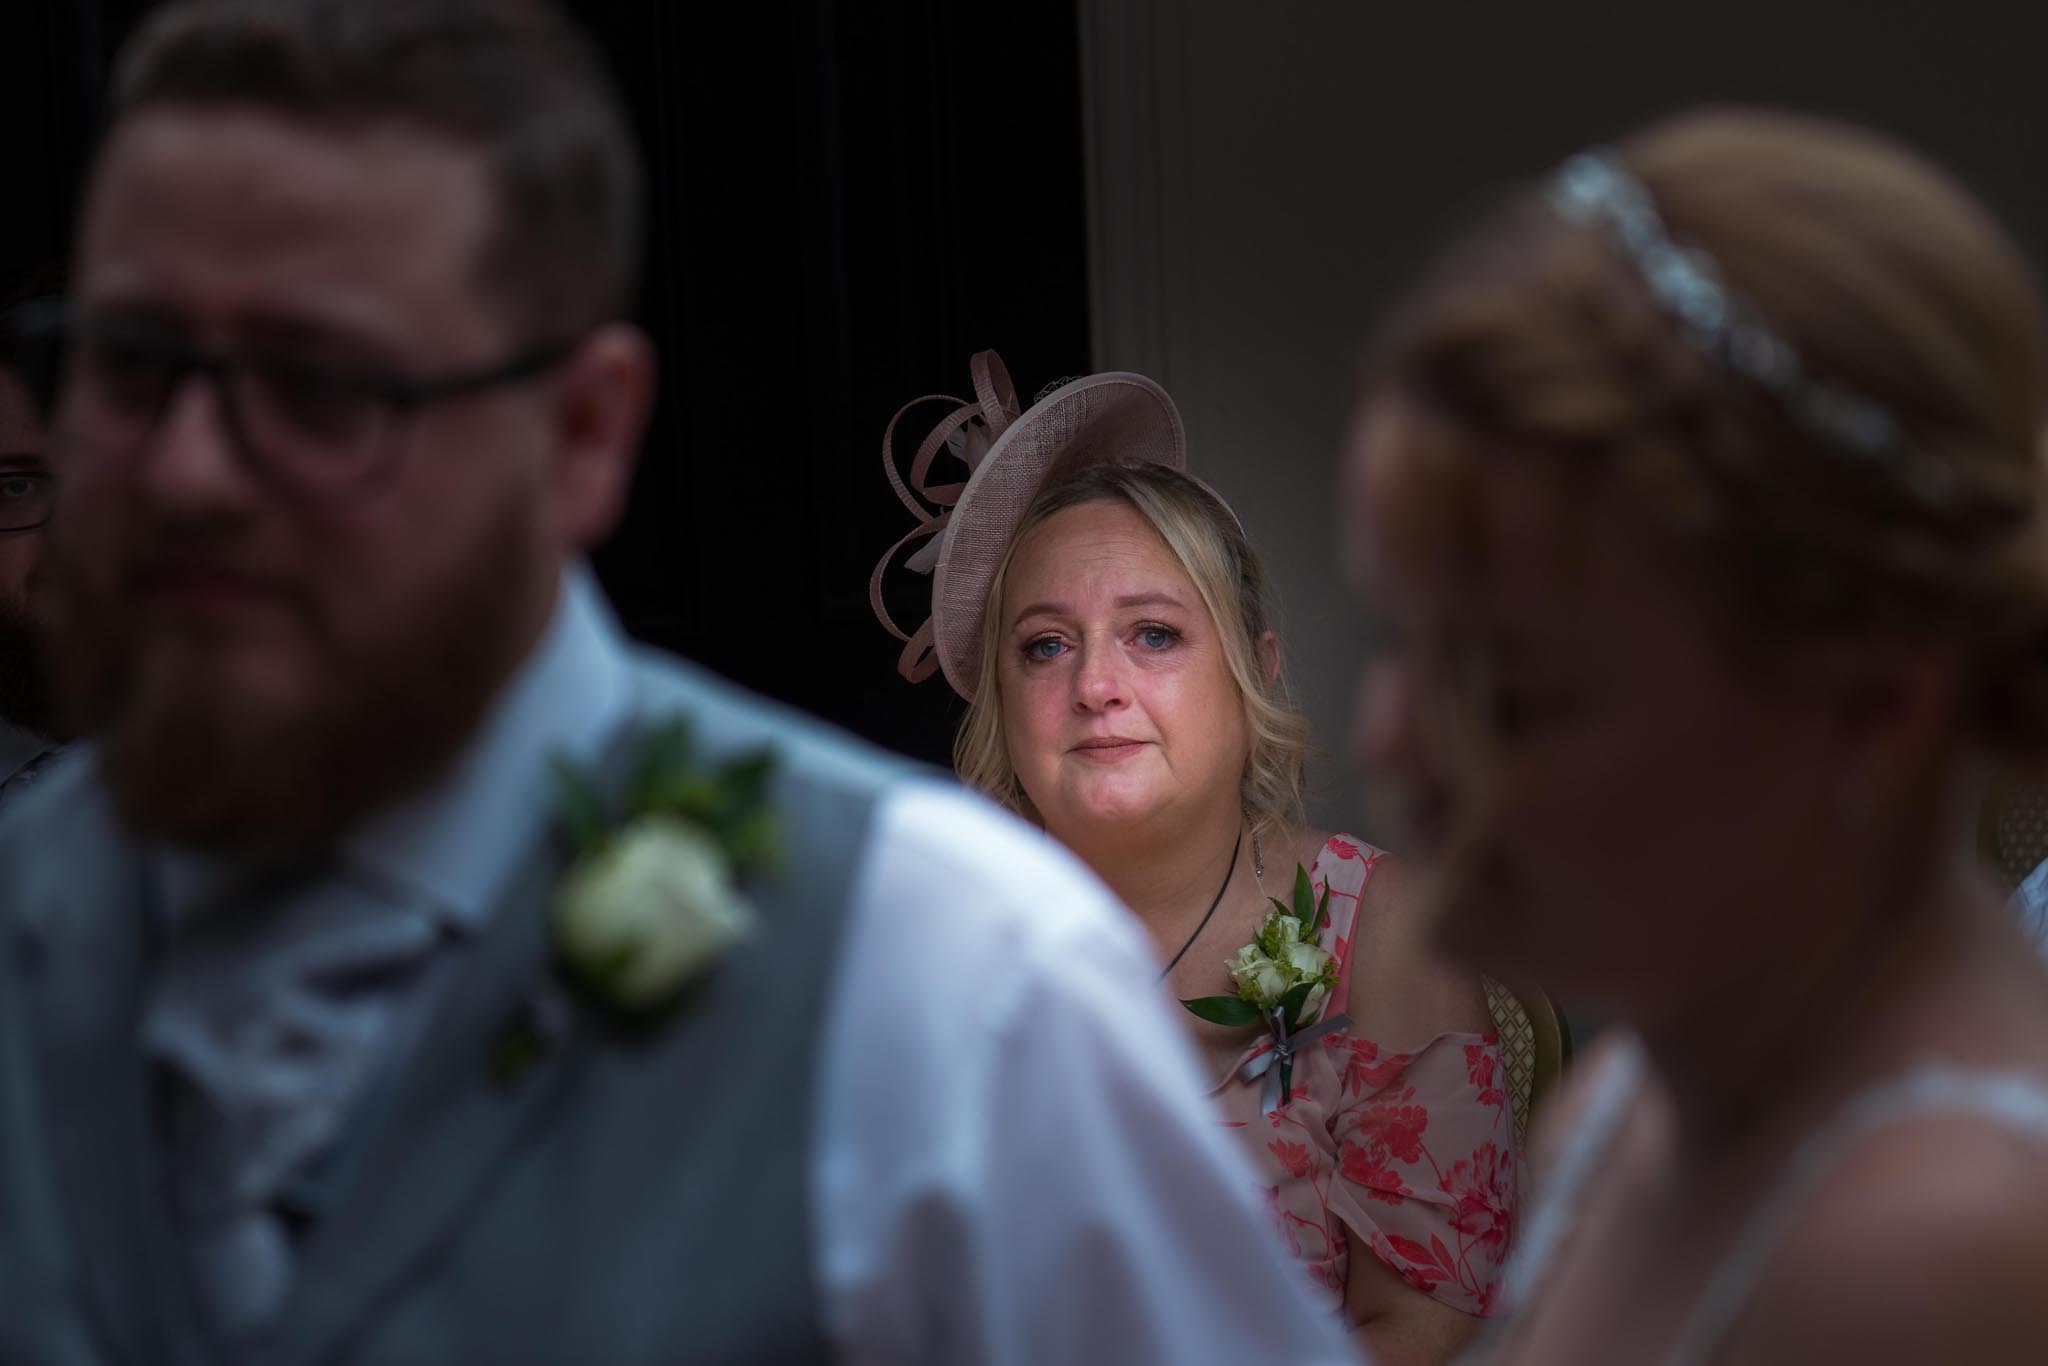 309-Ceremony-Luke-Yasmin-The-Rayleigh-Club-Wedding-Photography.jpg